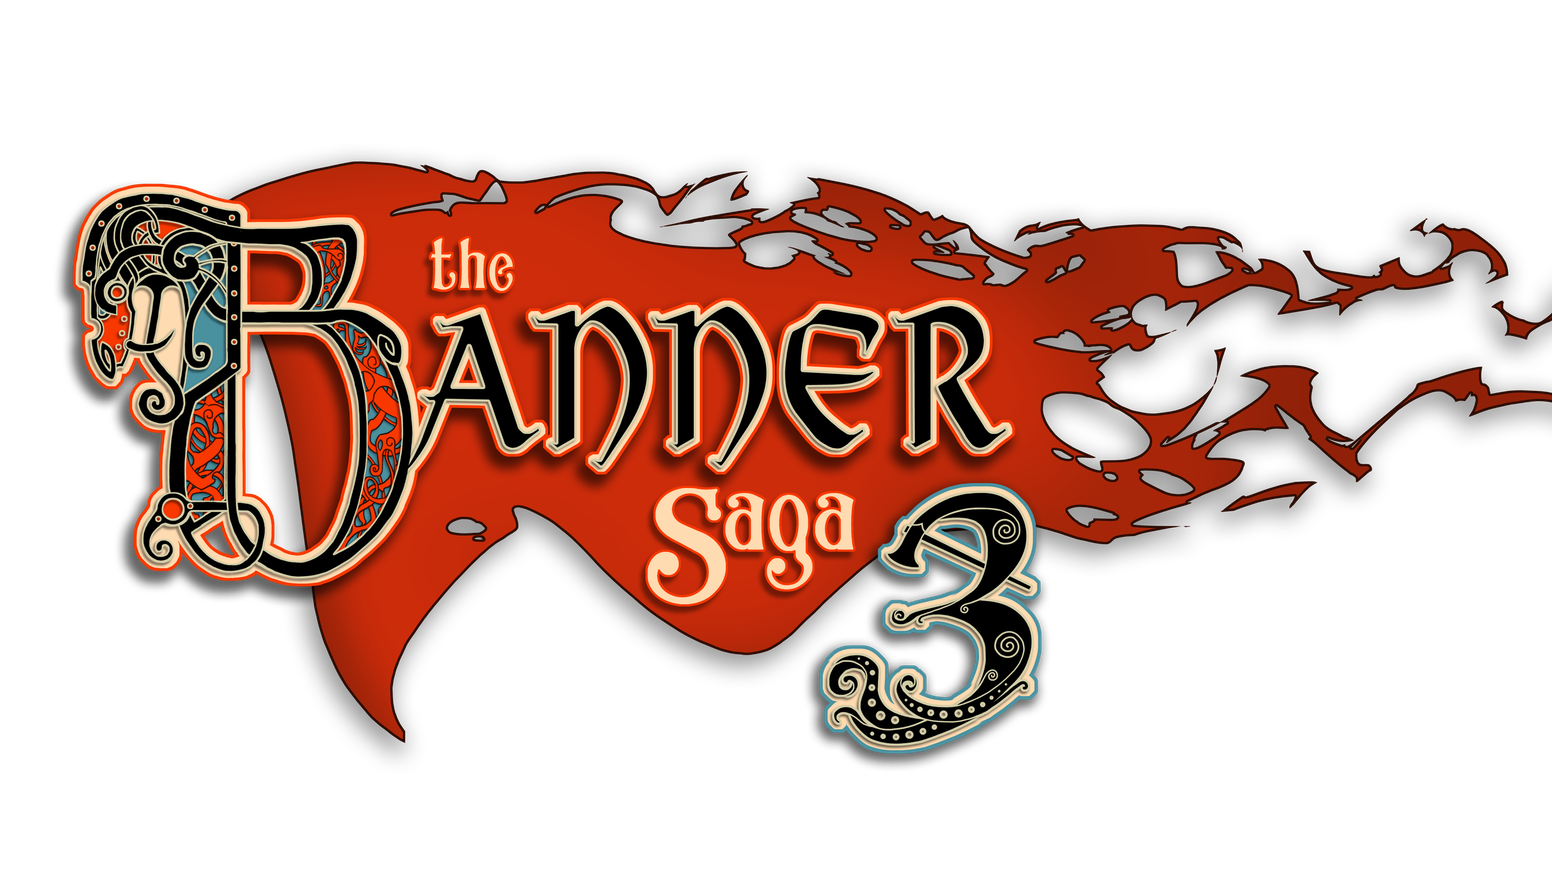 Saga by stoic kickstarter. Important clipart announcement banner